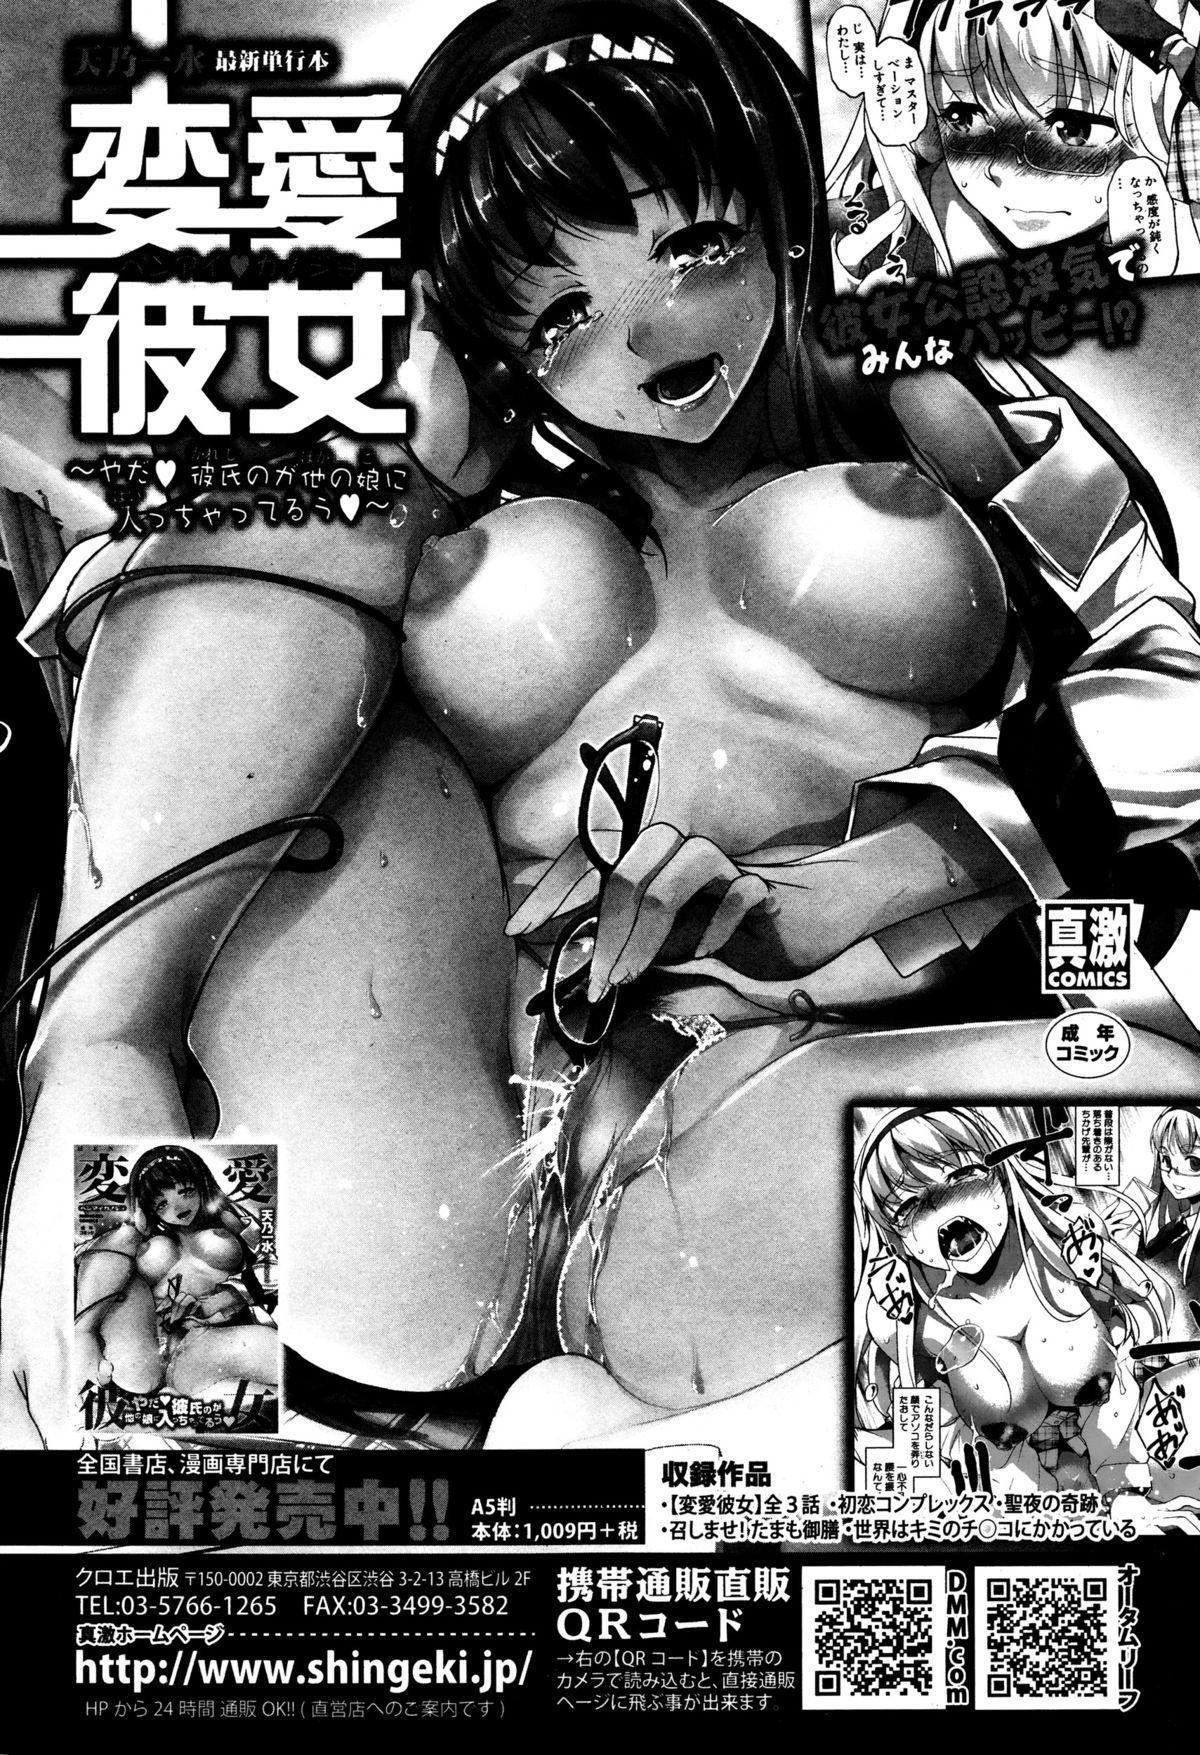 COMIC Shingeki 2016-01 222